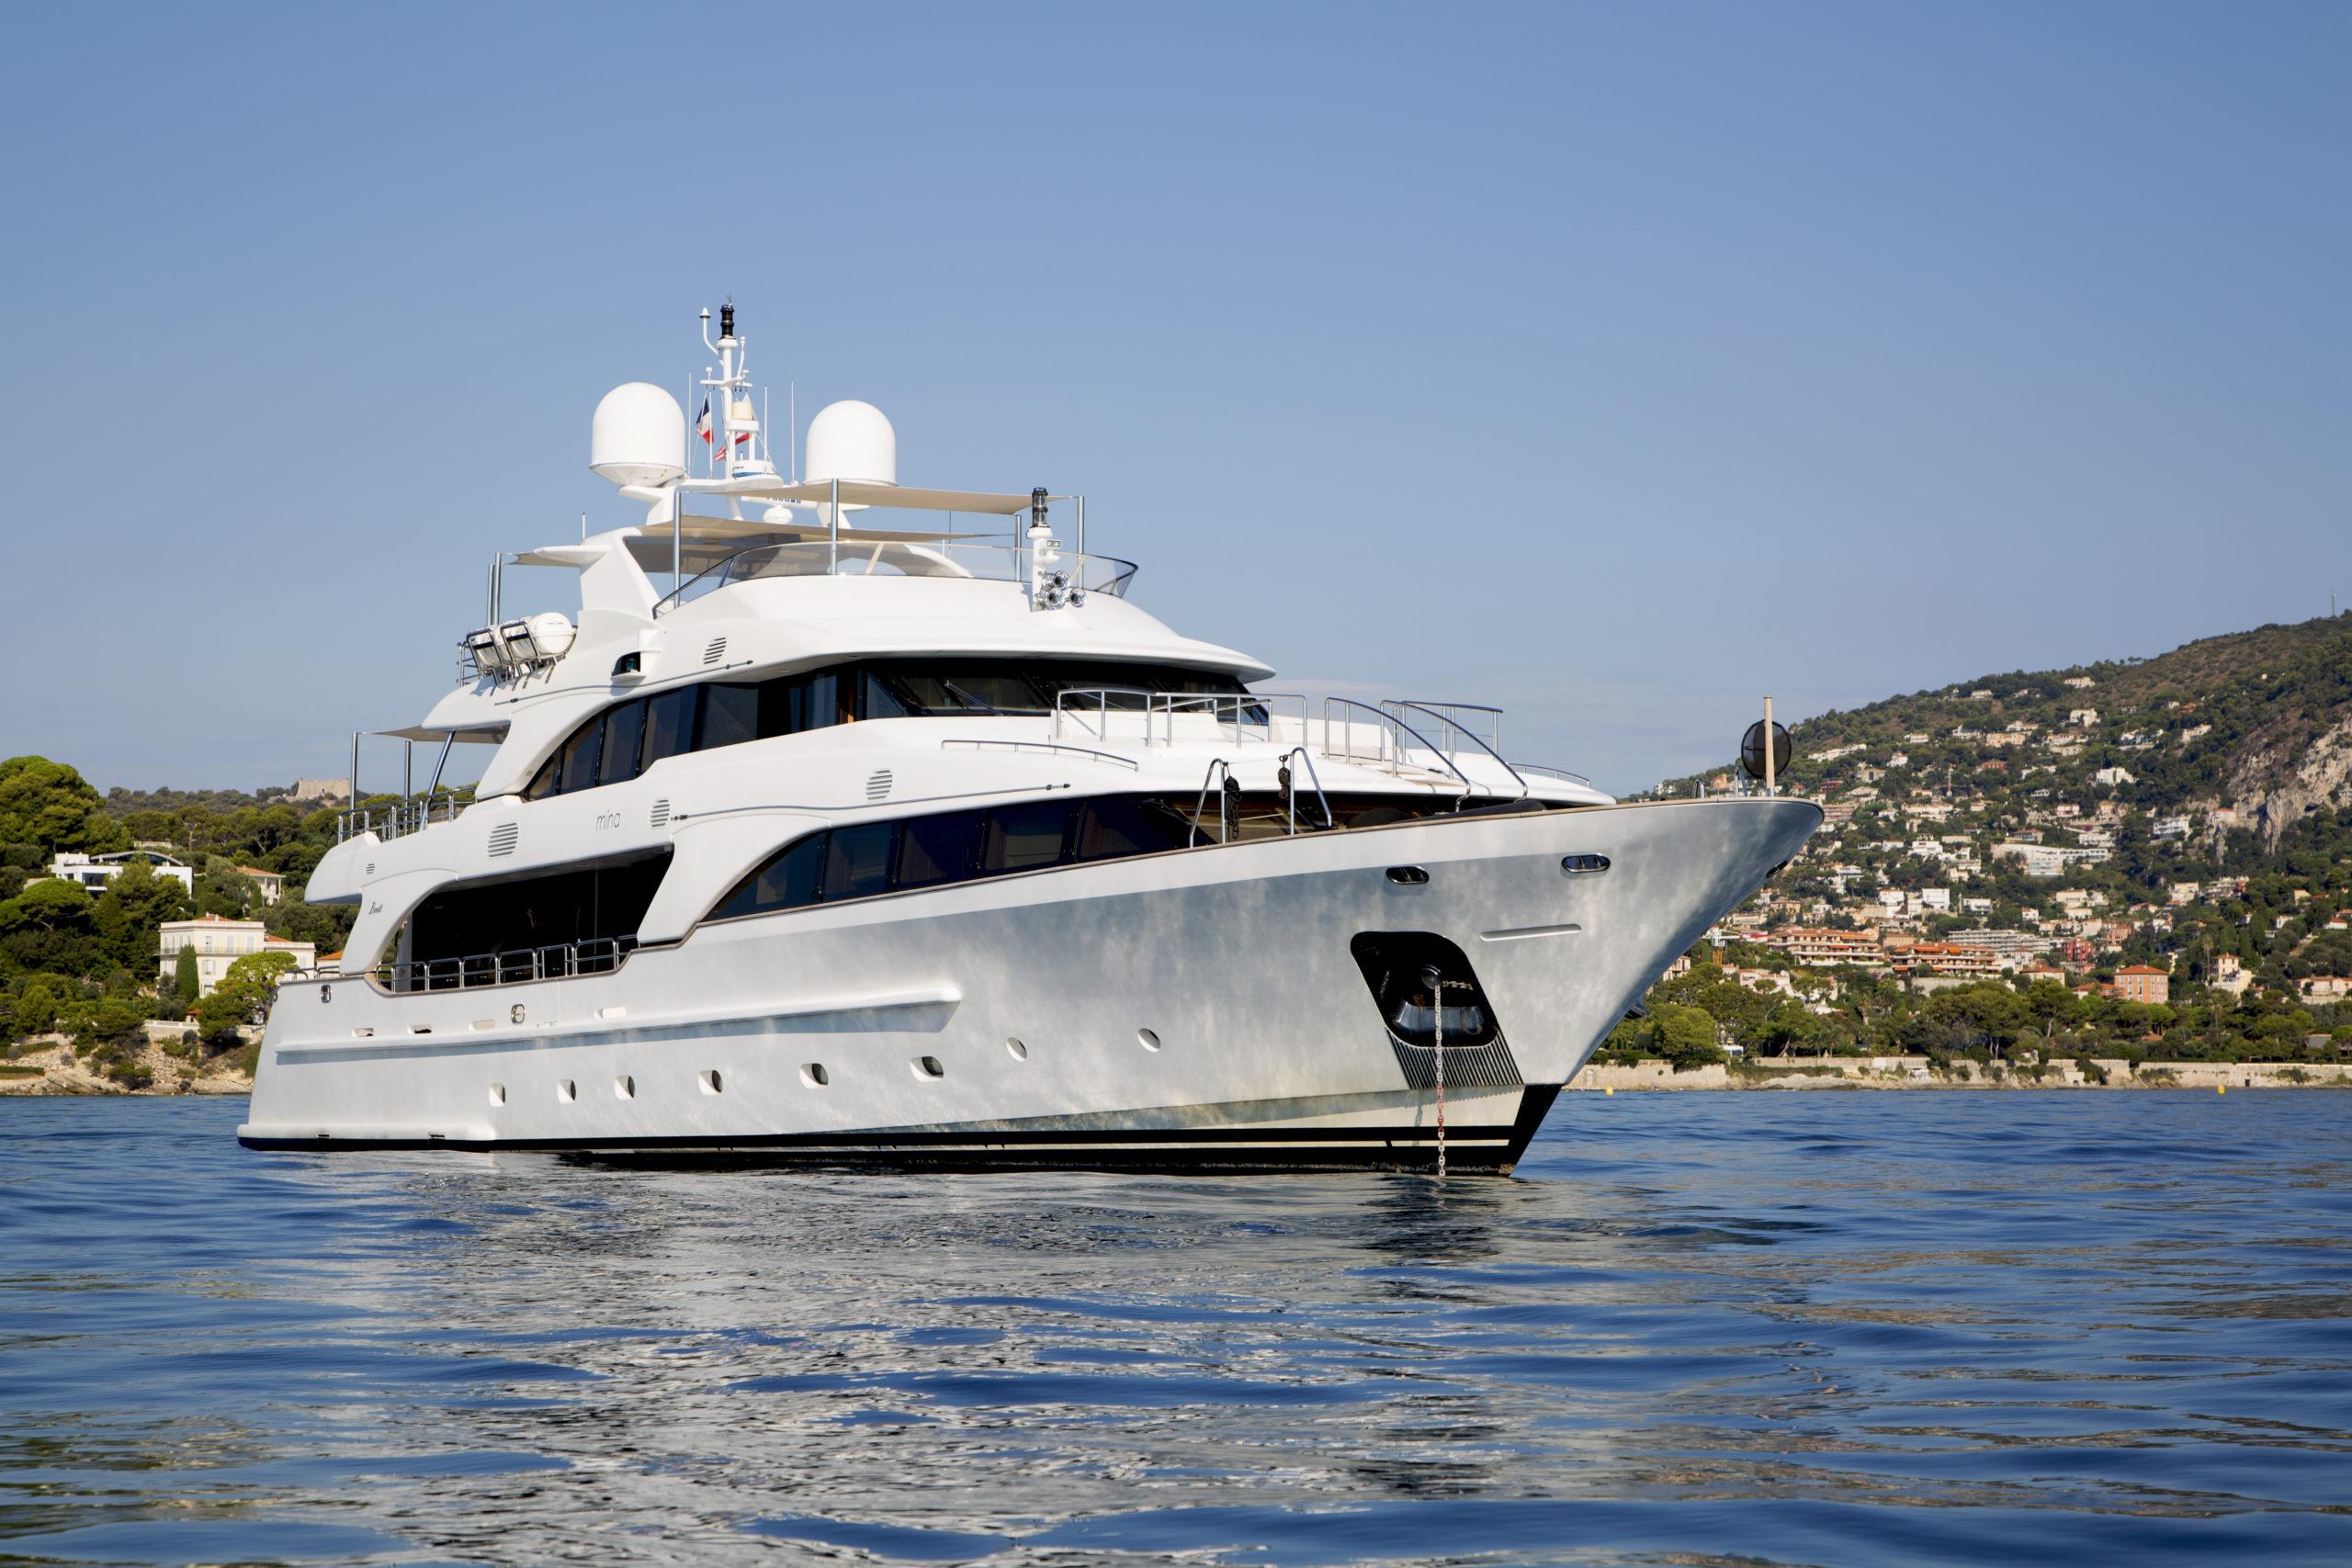 Benetti motor yacht Mina for sale with BlackOrange